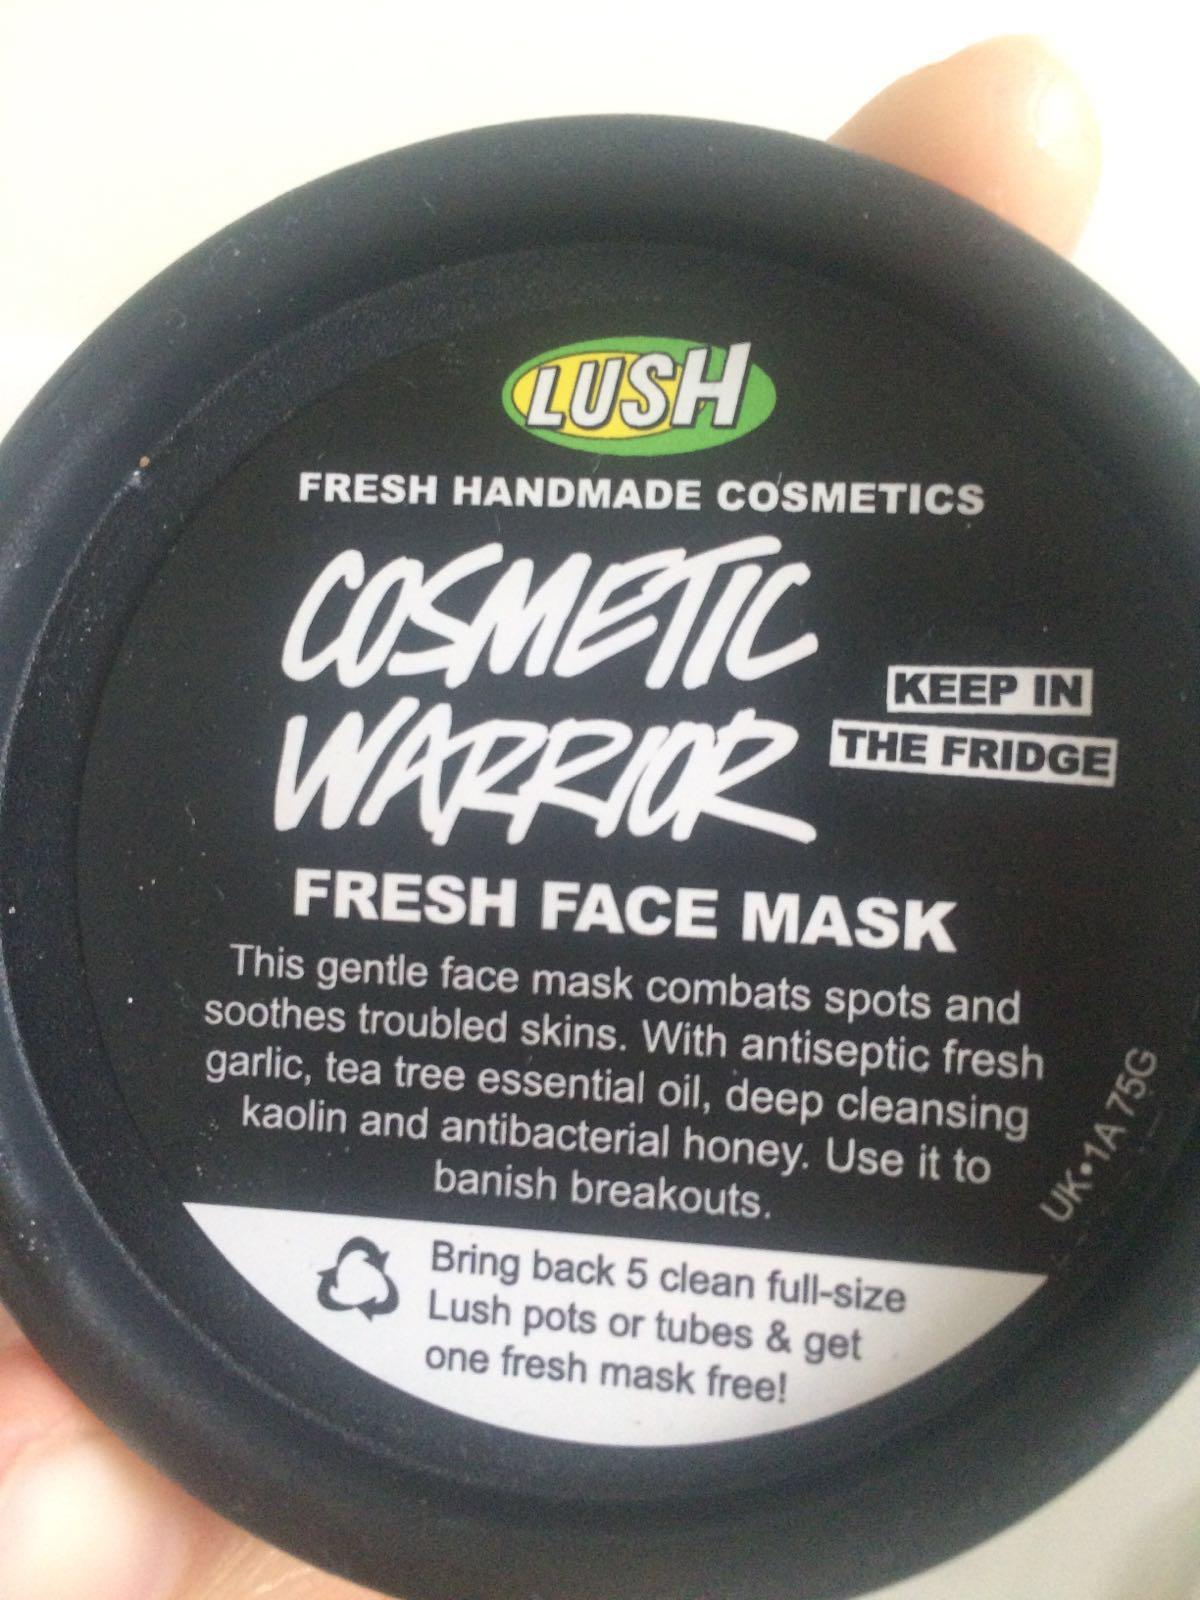 cosmetic warrior lush.jpg